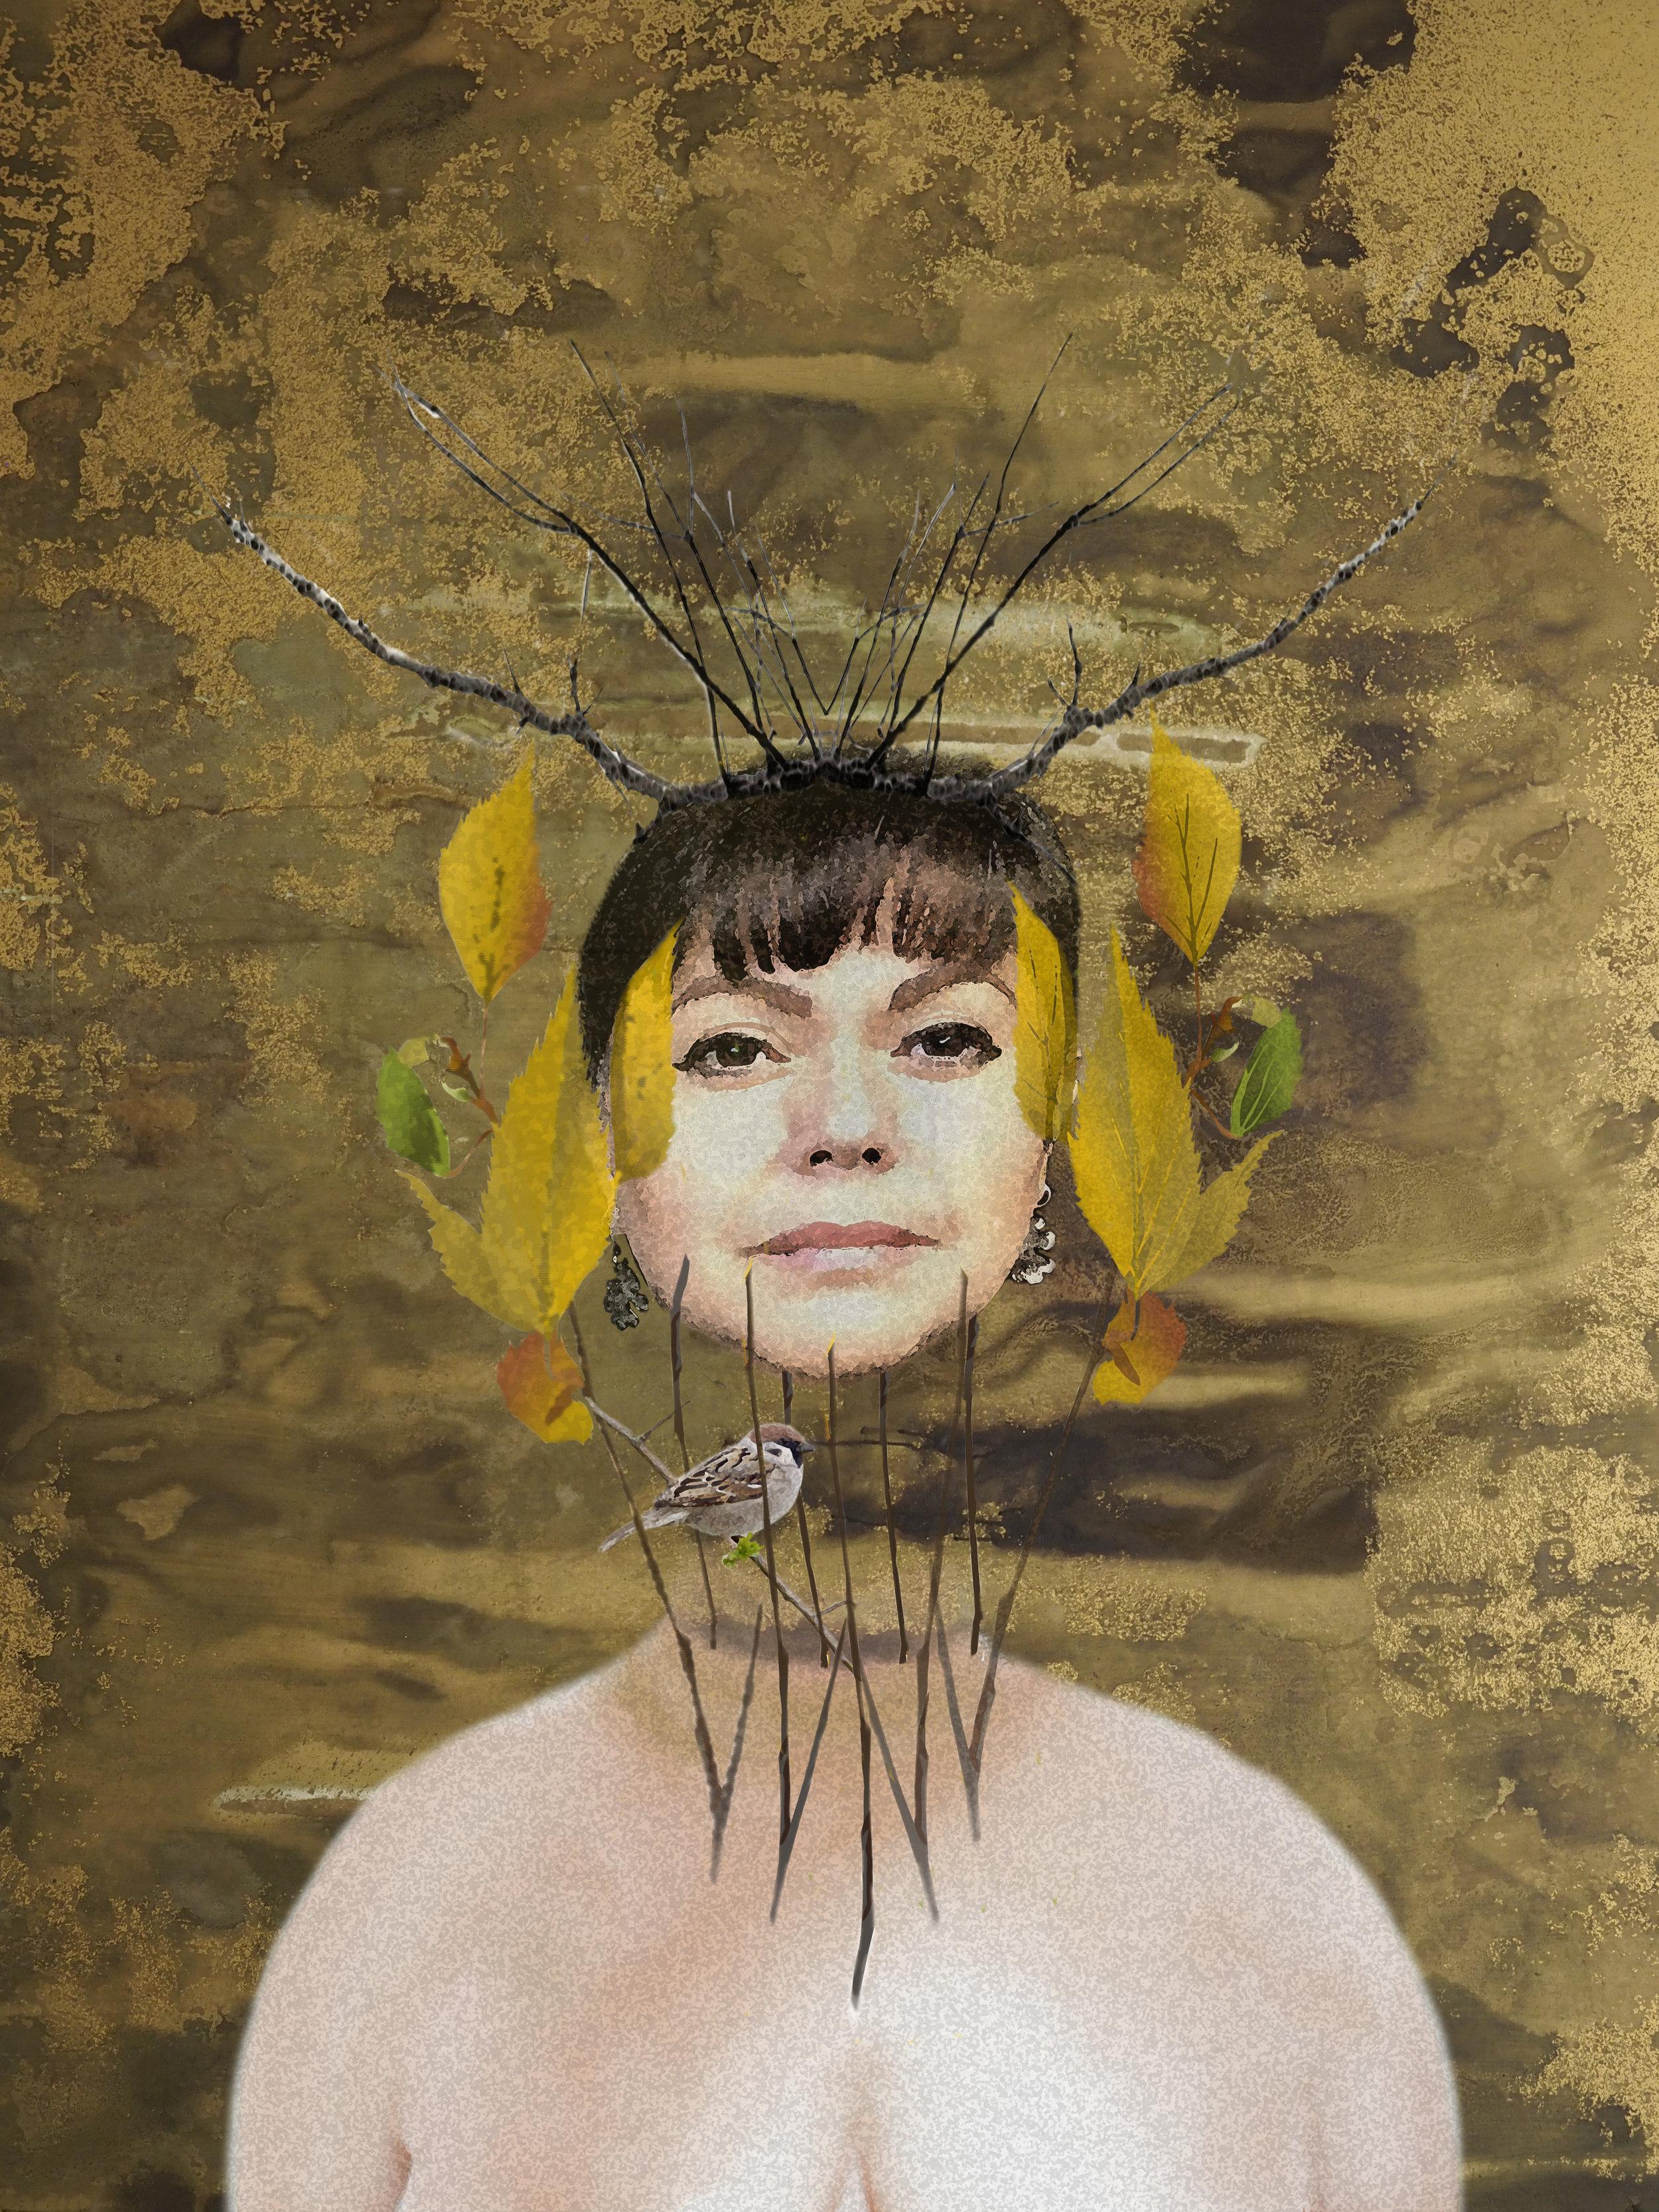 Entrapped Freedom - A Surreal PortraitMODEL | Self-Scrutiny